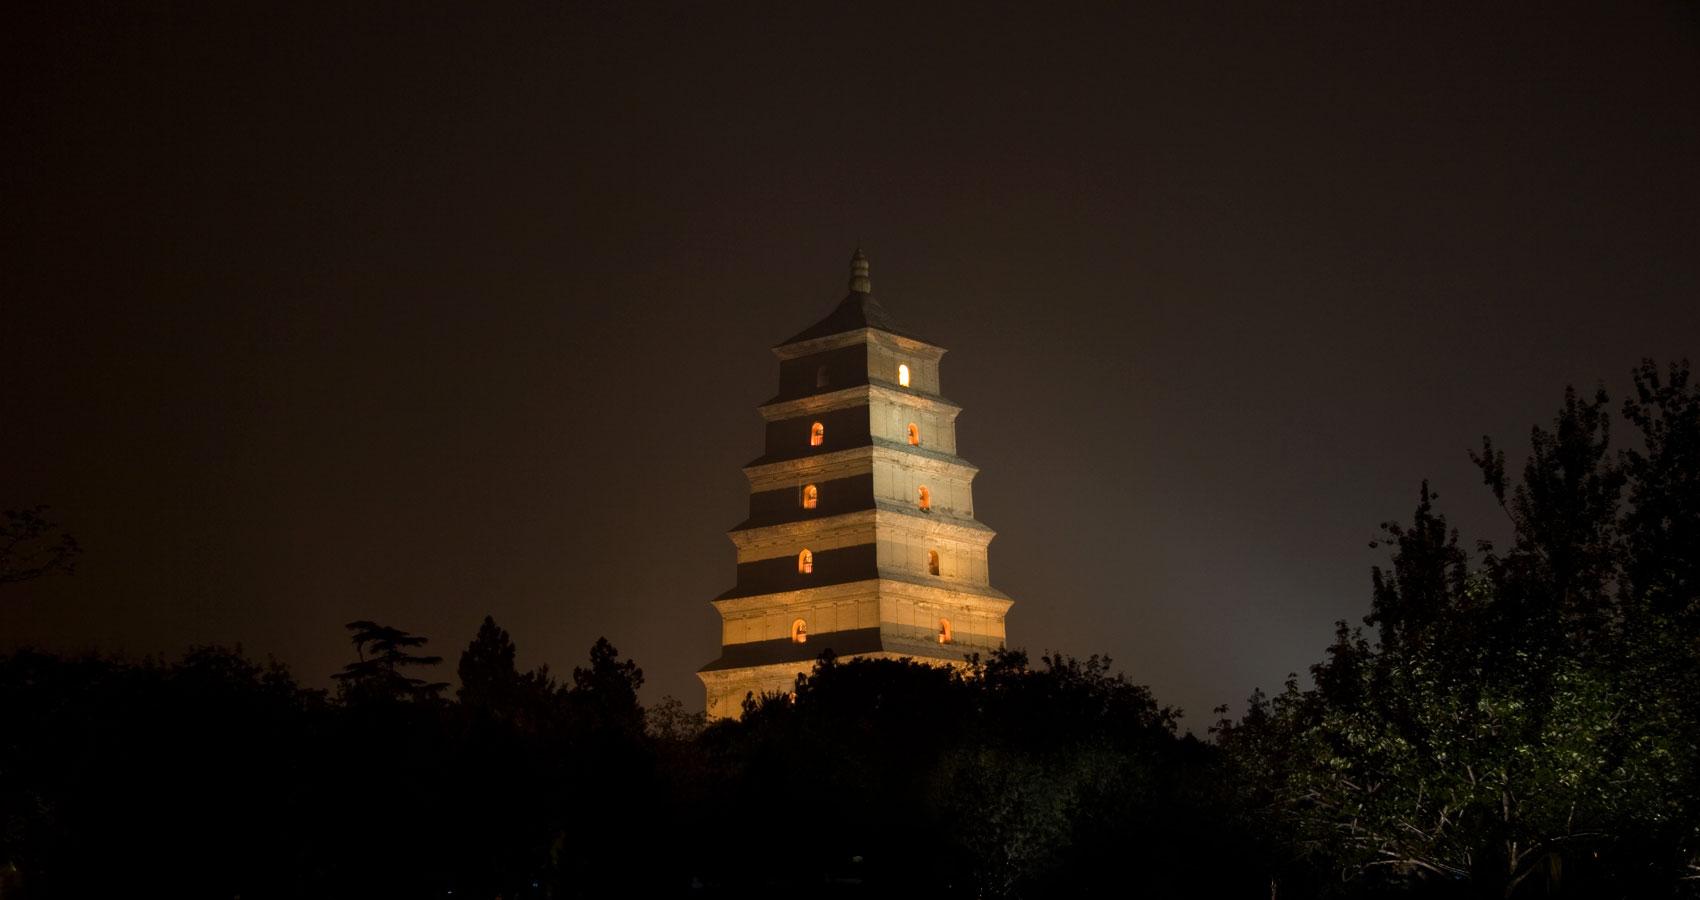 The Enchanted Pagoda by Cindy Medina at Spillwords.com